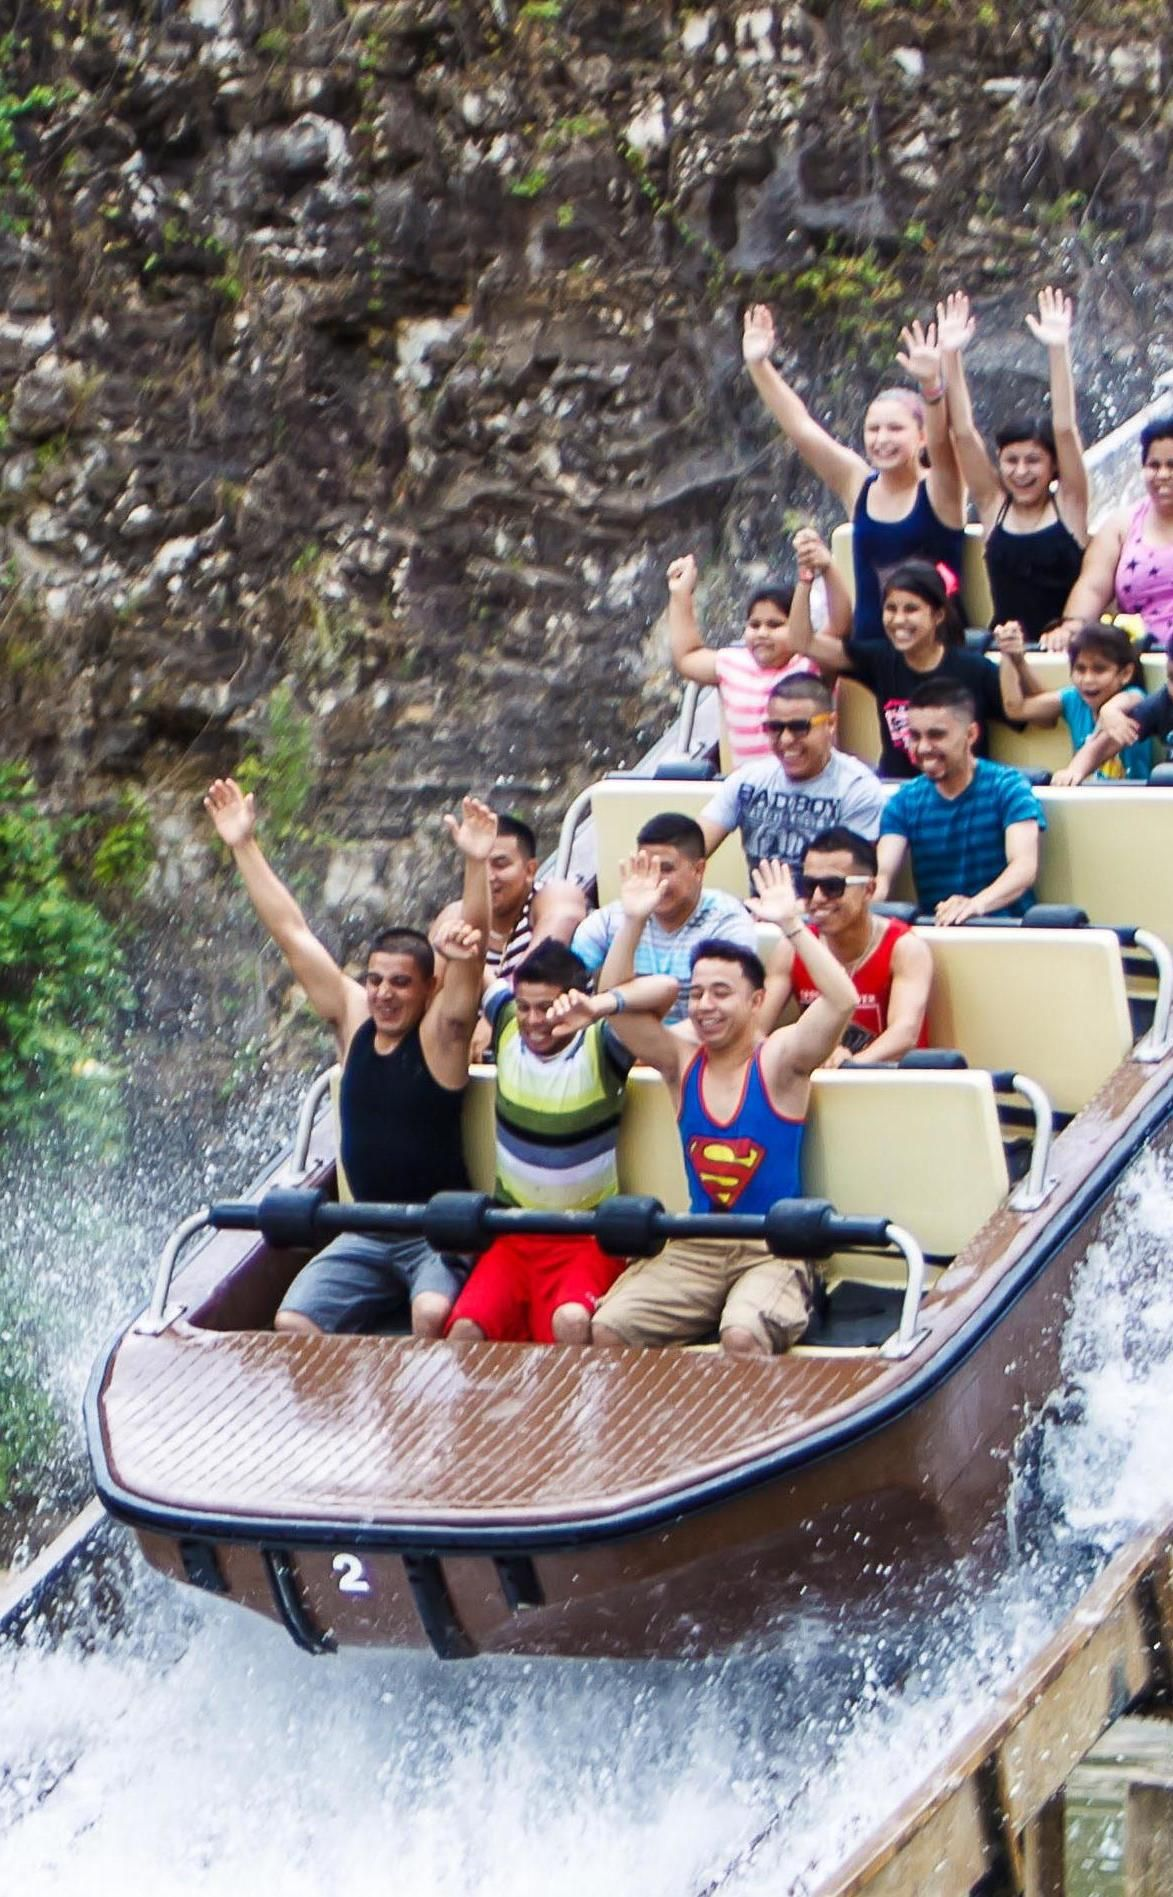 Six Flags Fiesta Texas | Travel | Vacation Ideas | Road Trip | Places to Visit | San Antonio | TX | Water Park | Tourist Attraction | Children's Attraction | Amusement Park